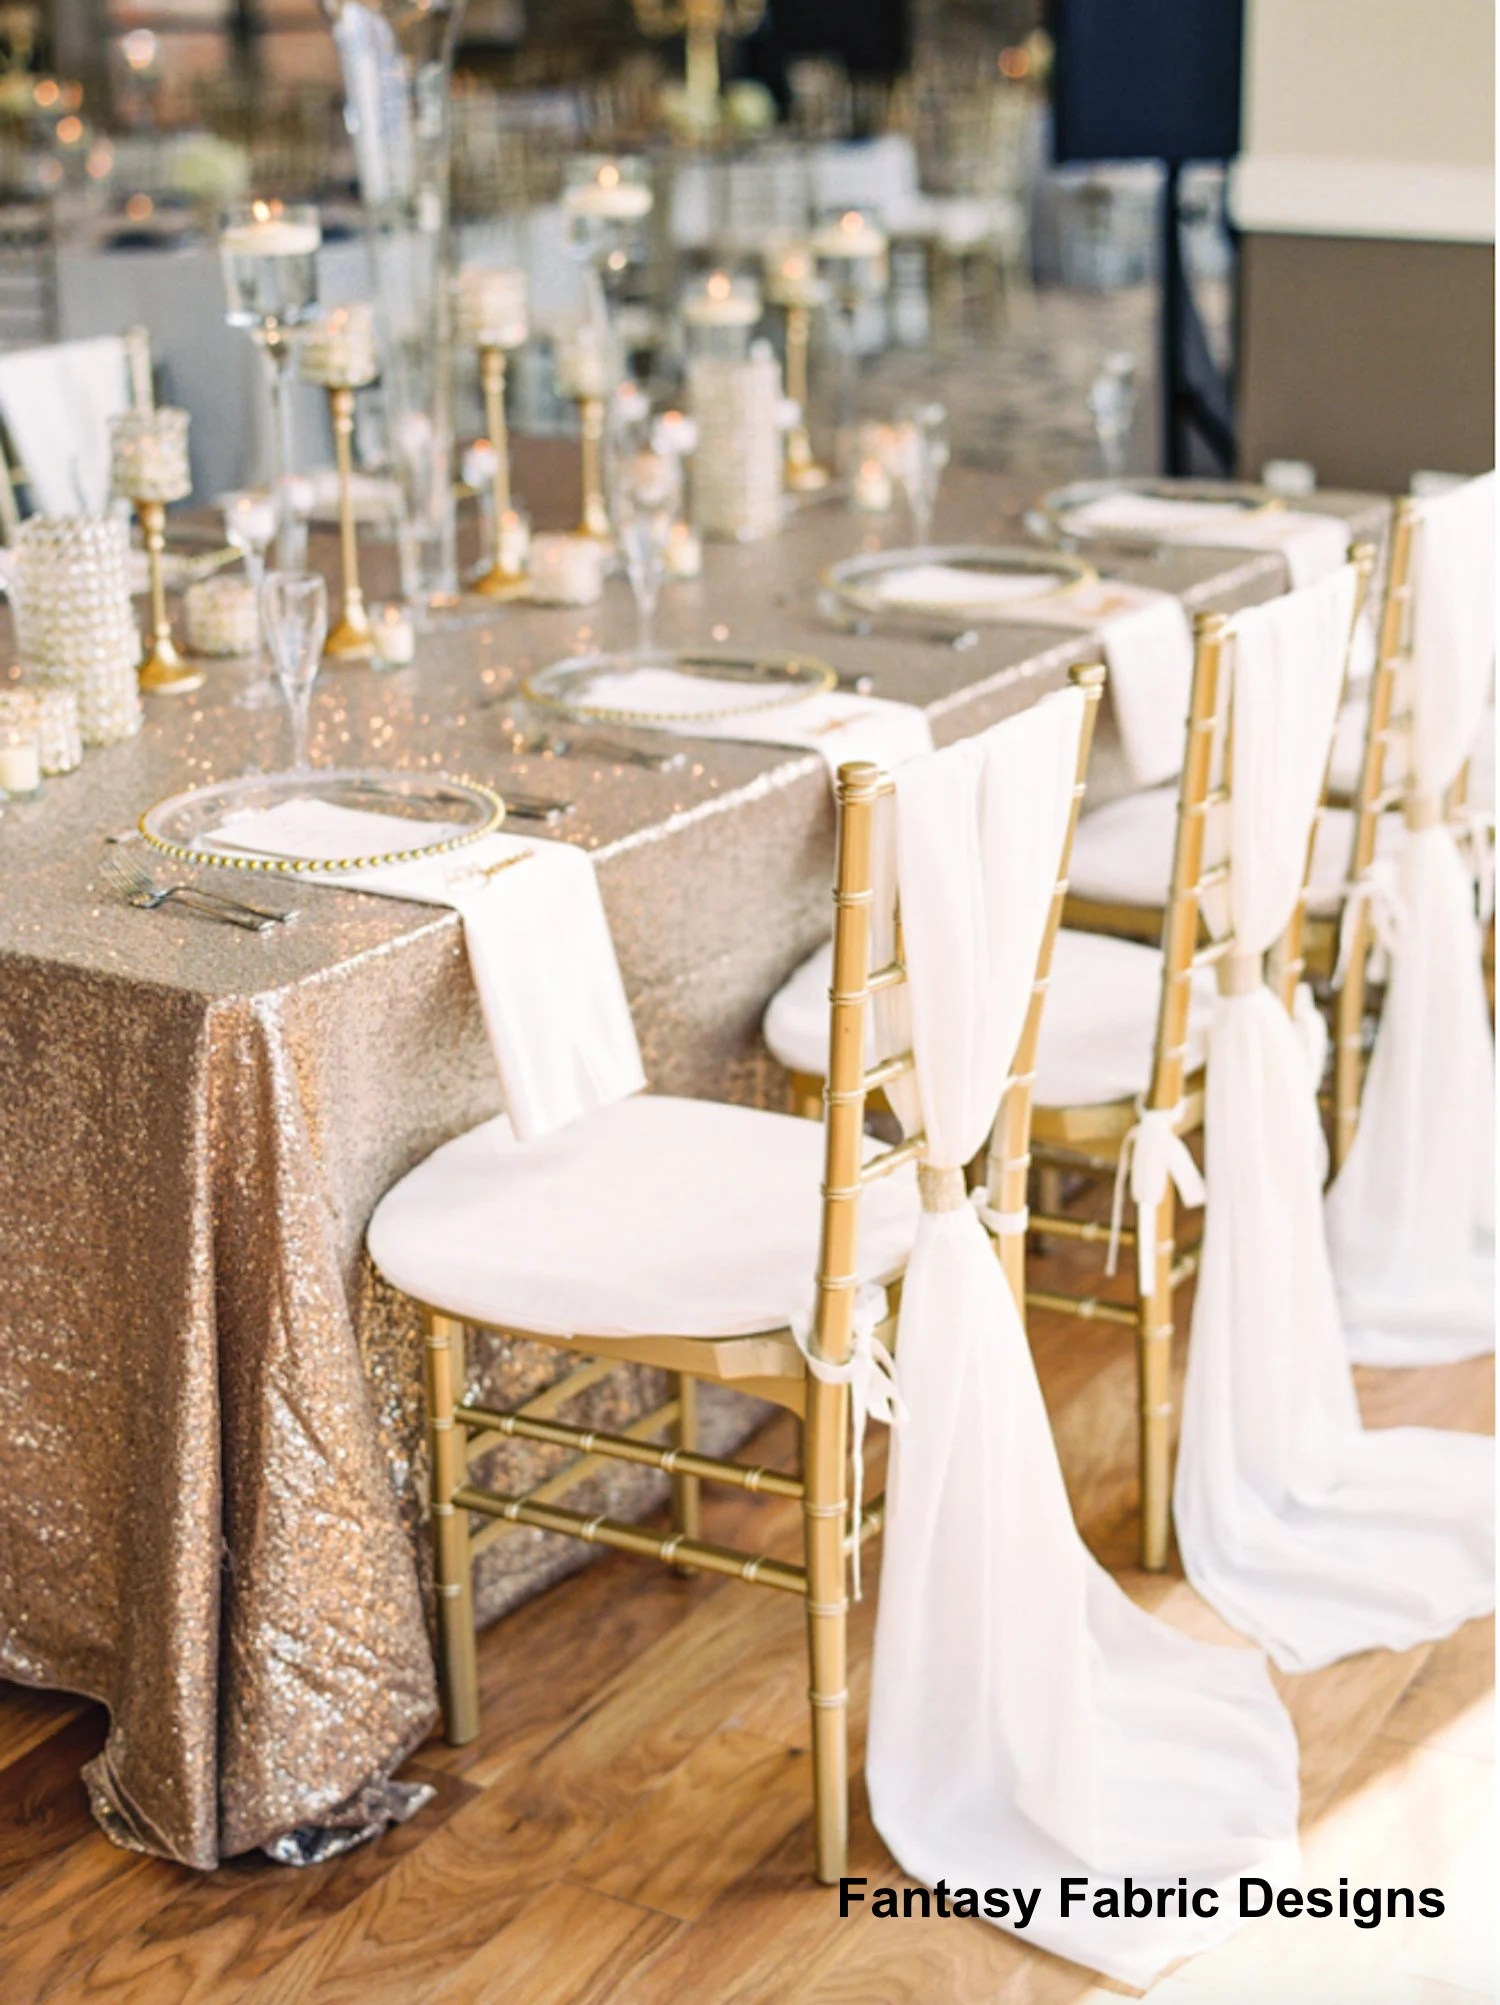 chair back covers wedding ebay for weddings chiavari cover etsy cushion decor bridal baby shower